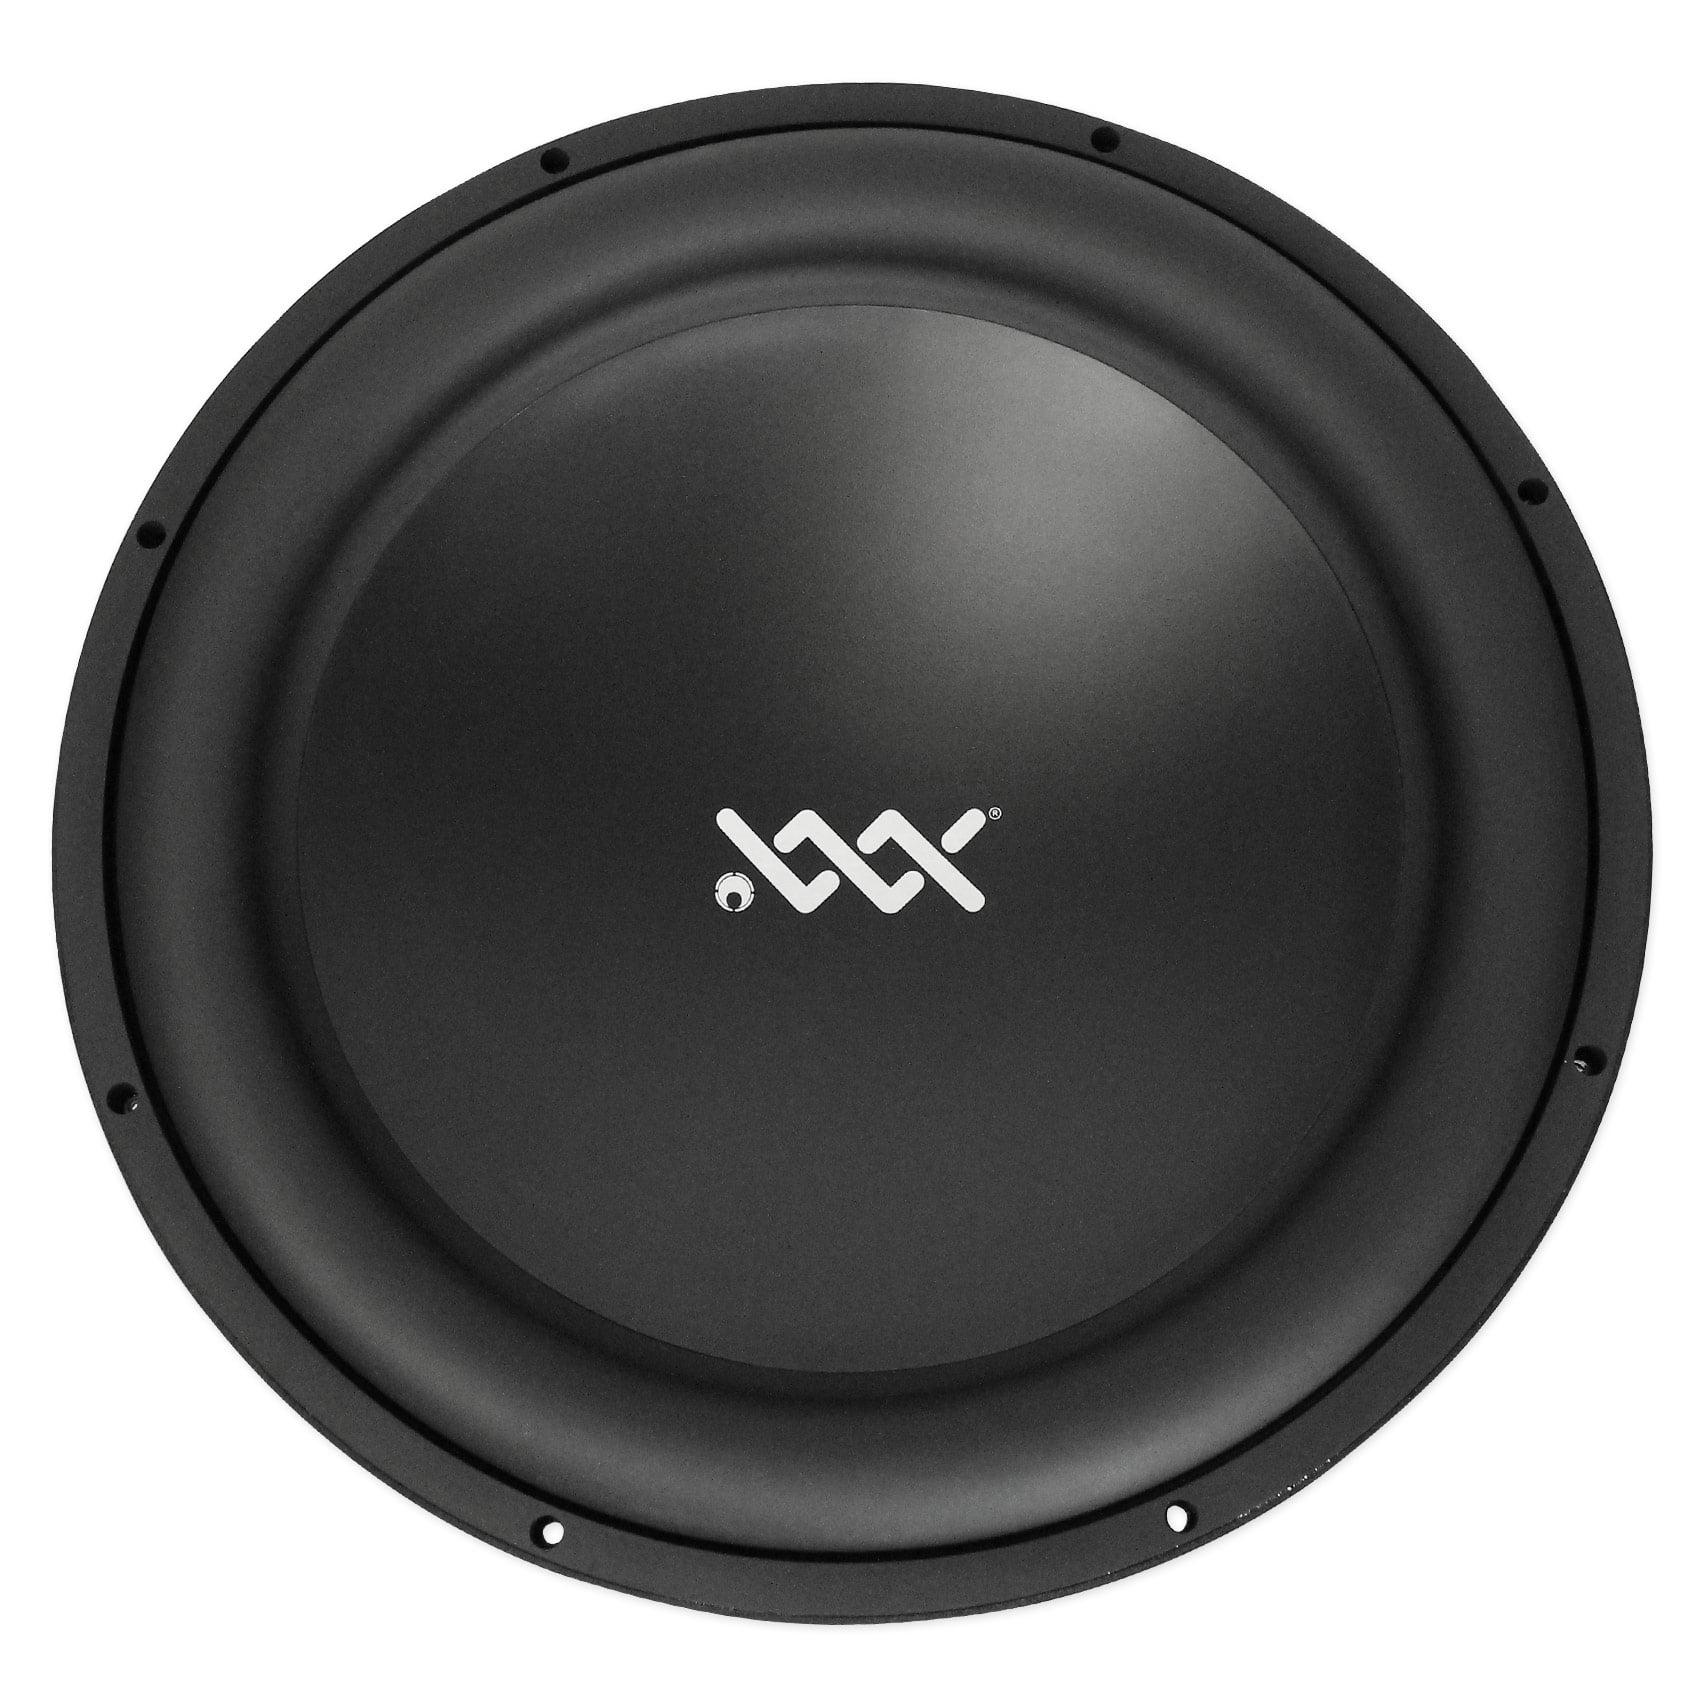 "Re-Audio XXX18D2 V2 18"" 2000W RMS Dual 2-Ohm Car Subwoofe..."